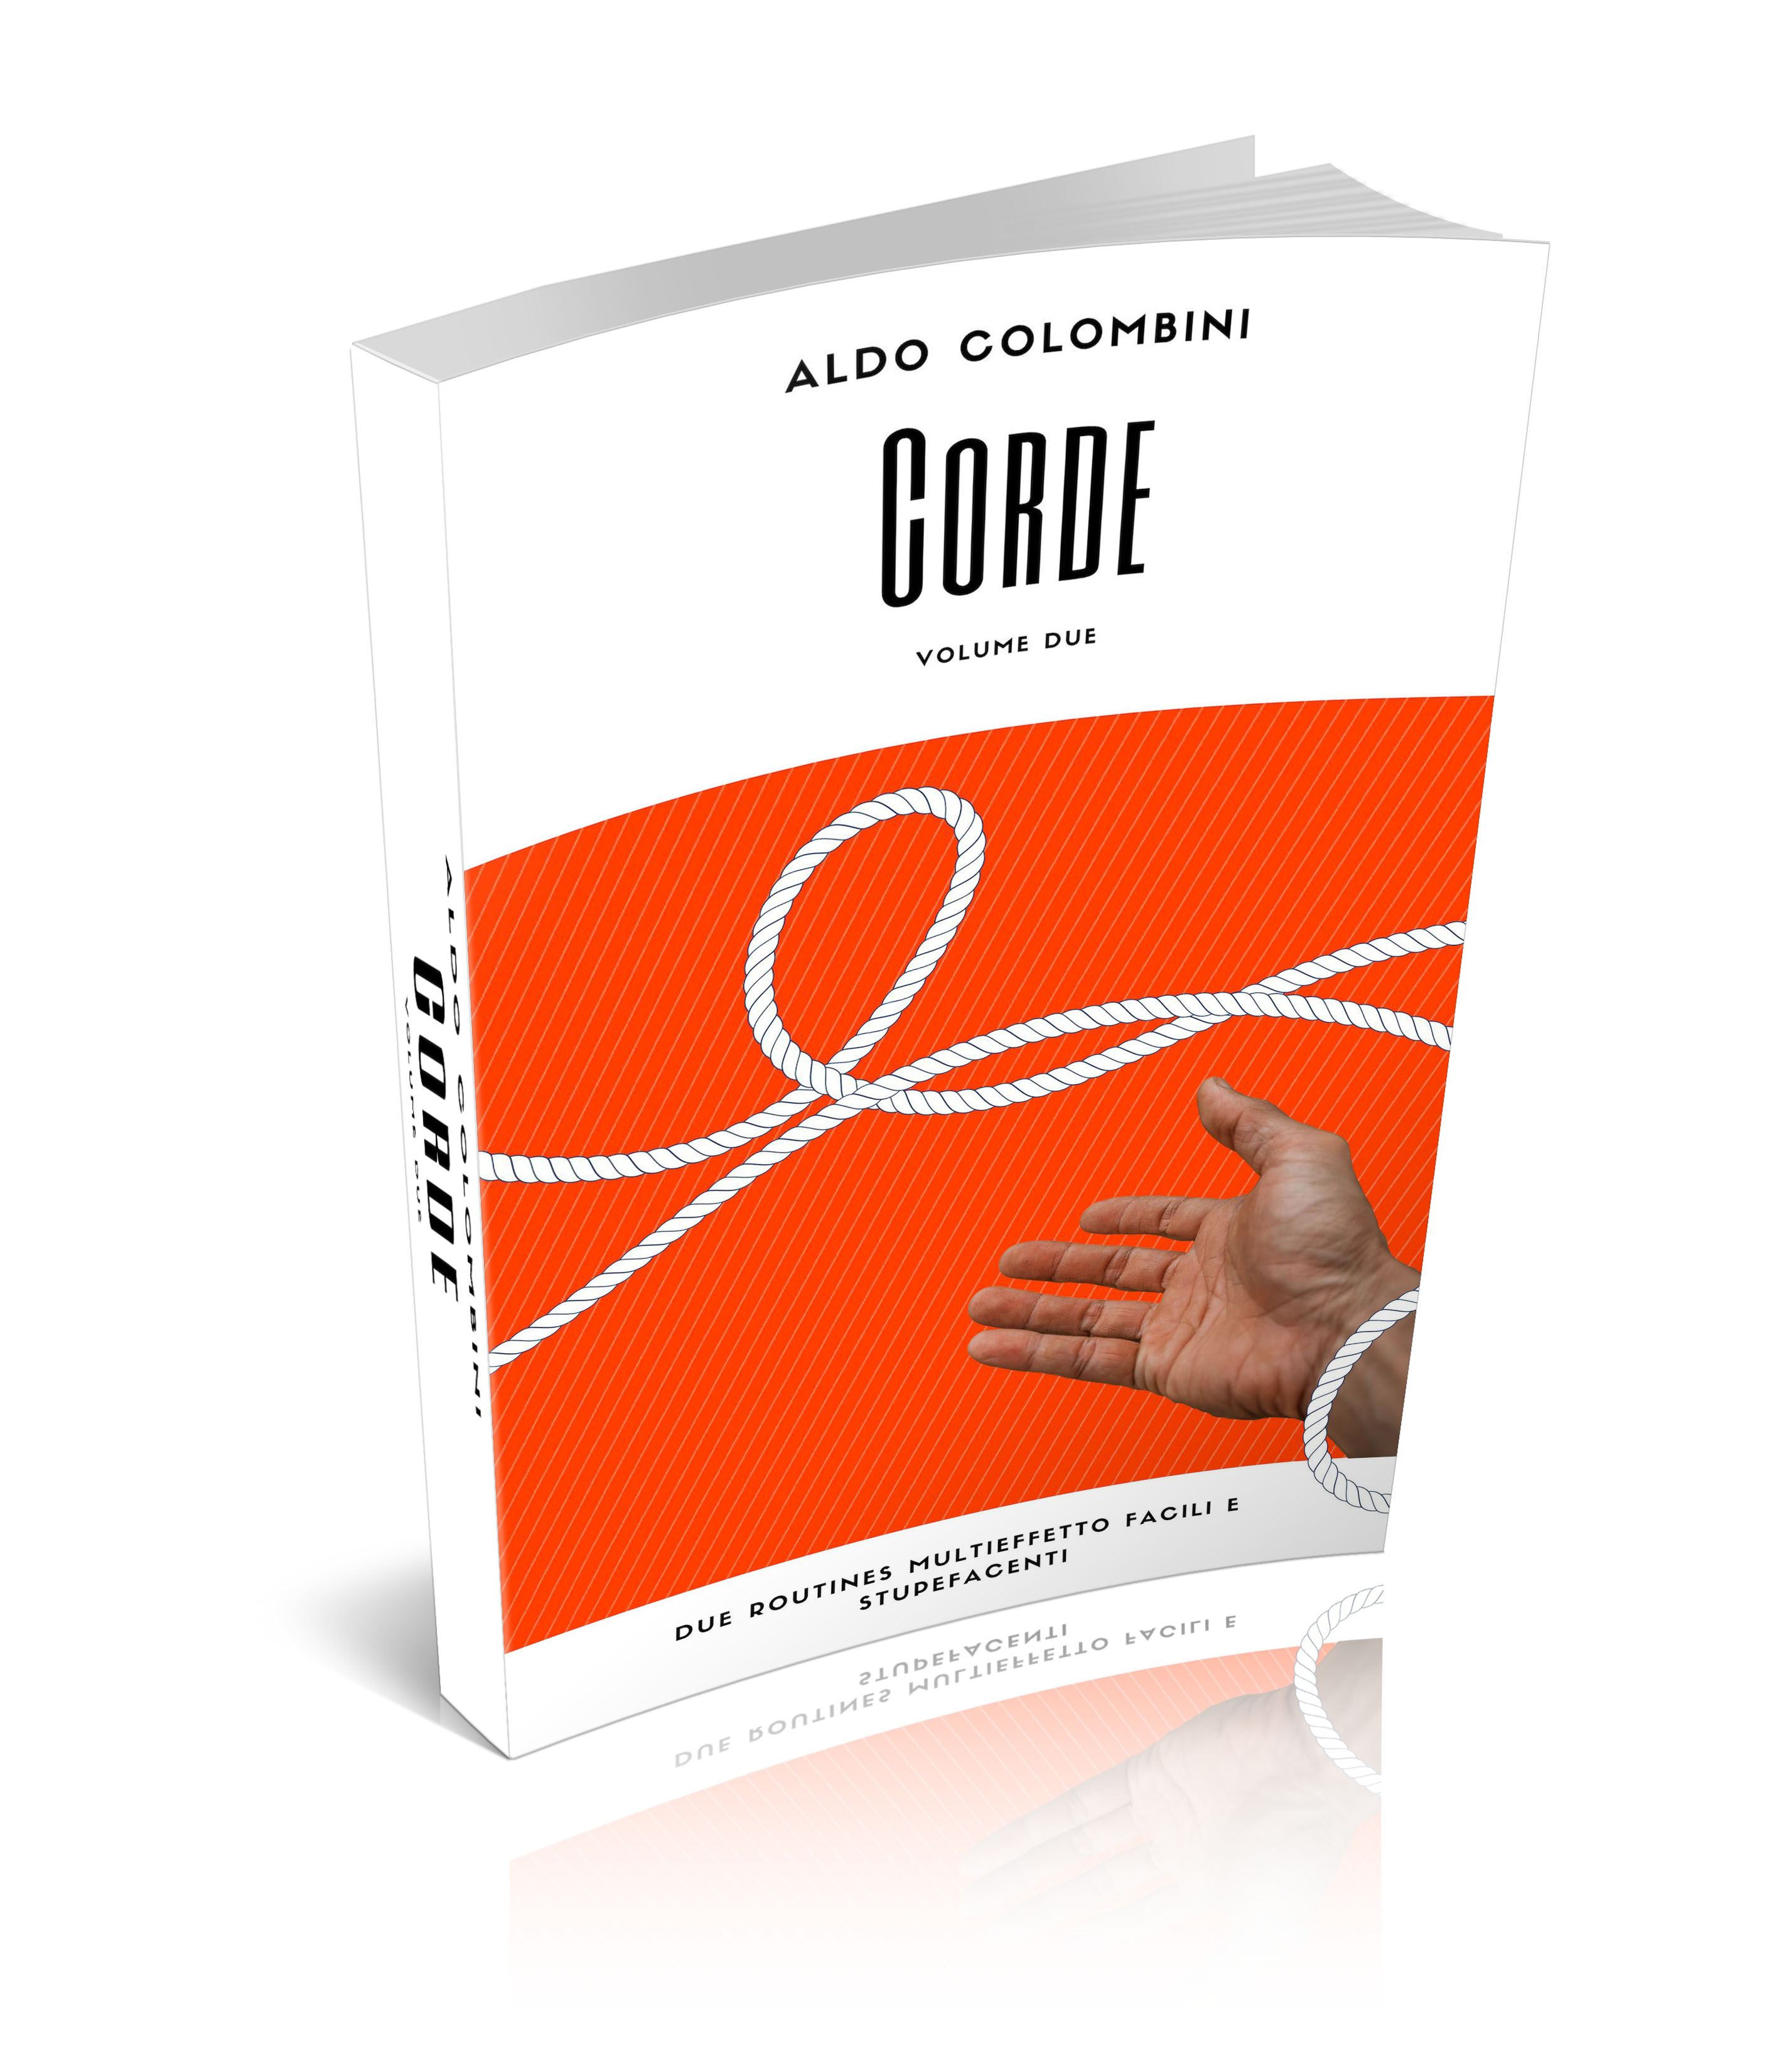 Corde Vol 2